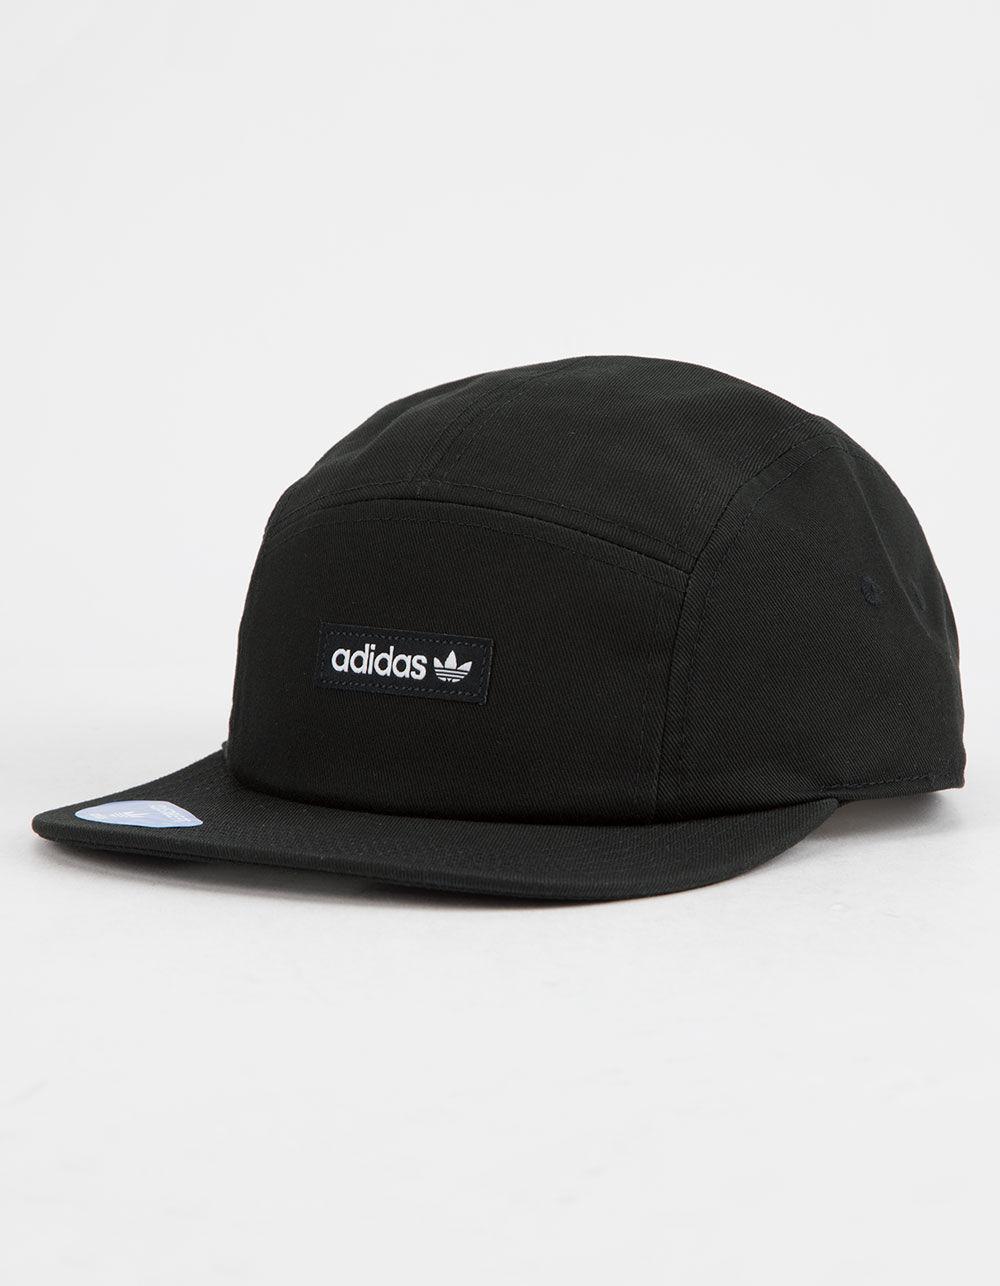 0e3ba8ffb7d Lyst - adidas Originals Five-panel Forum Mens Strapback Hat in Black ...